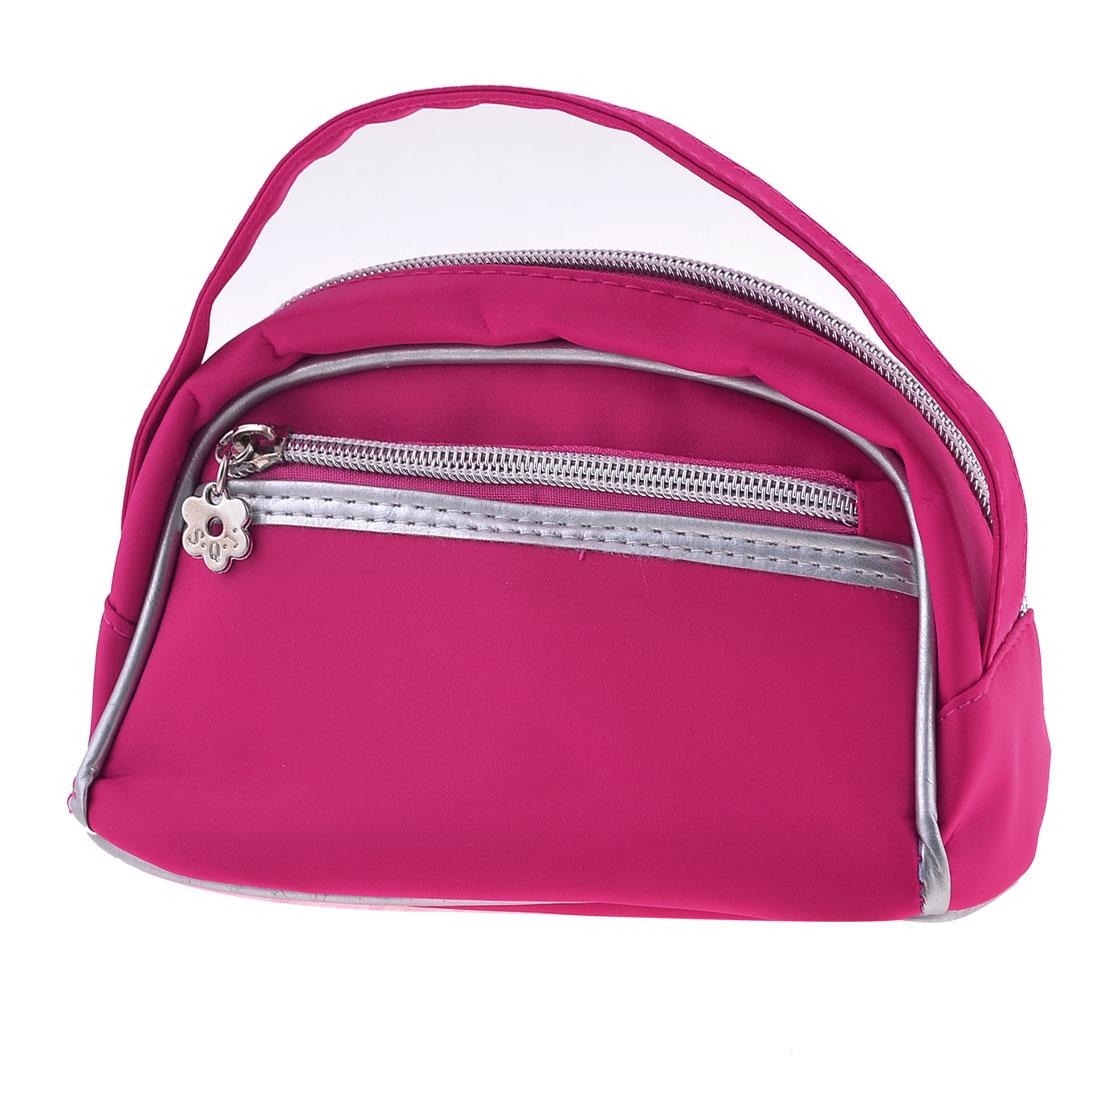 Lady Polyester Zipper Closure Make Up Case Handbag w Mirror Fuchsia